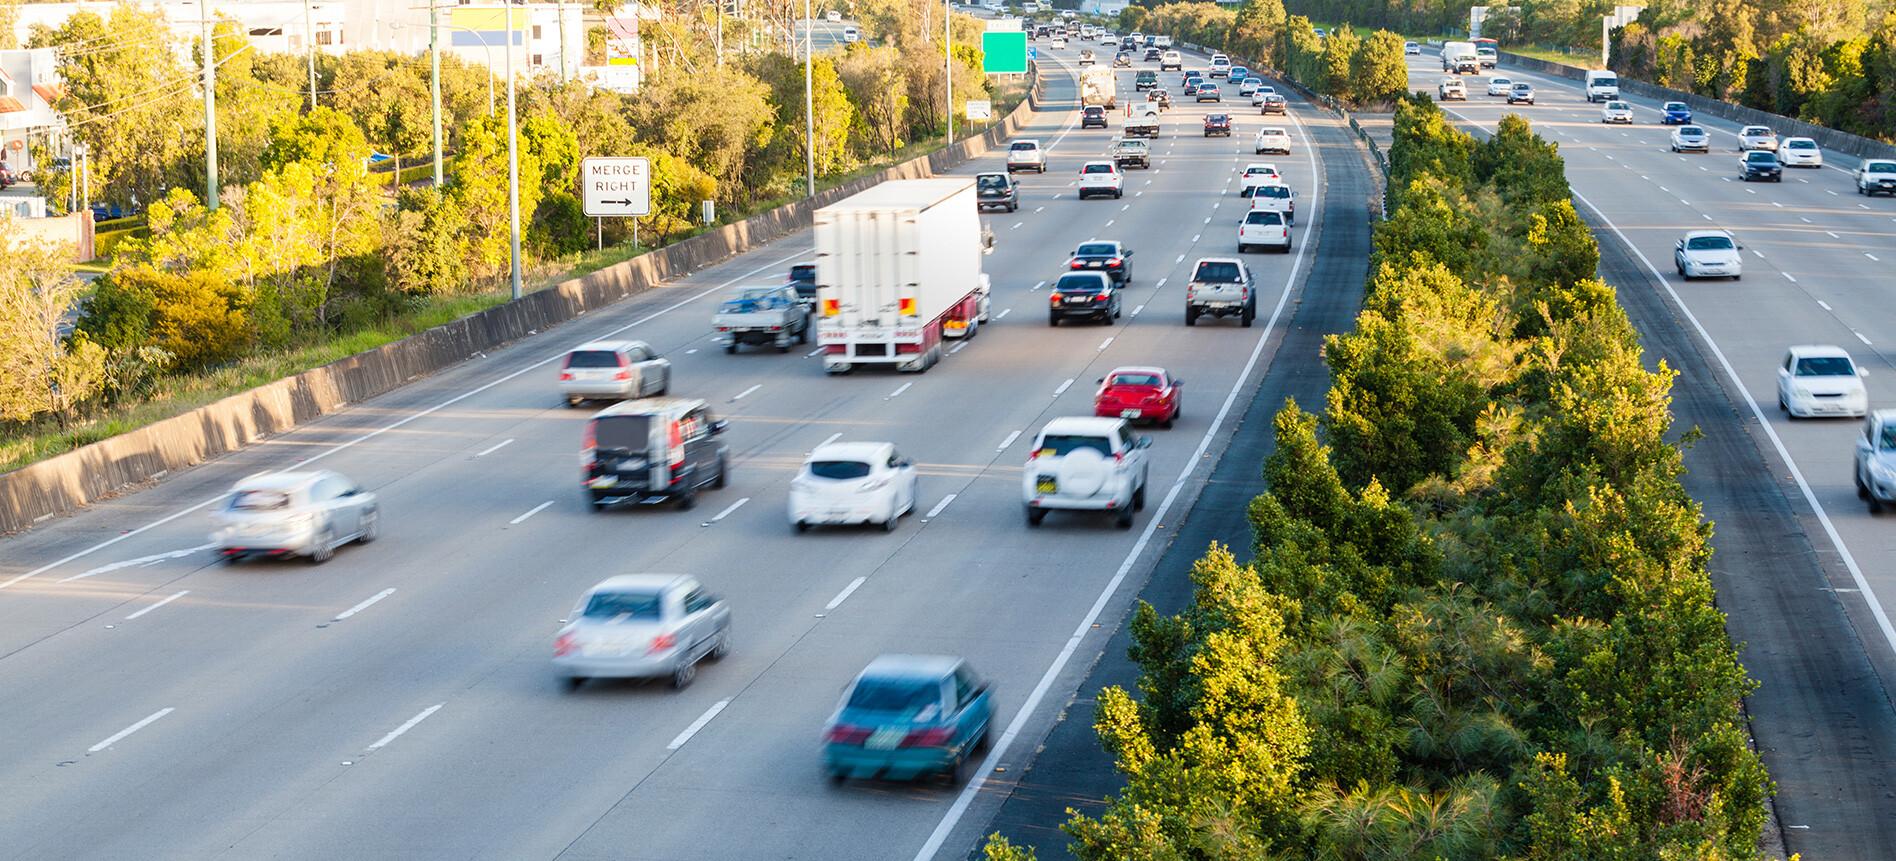 Cars Driving On Freeway Jpg